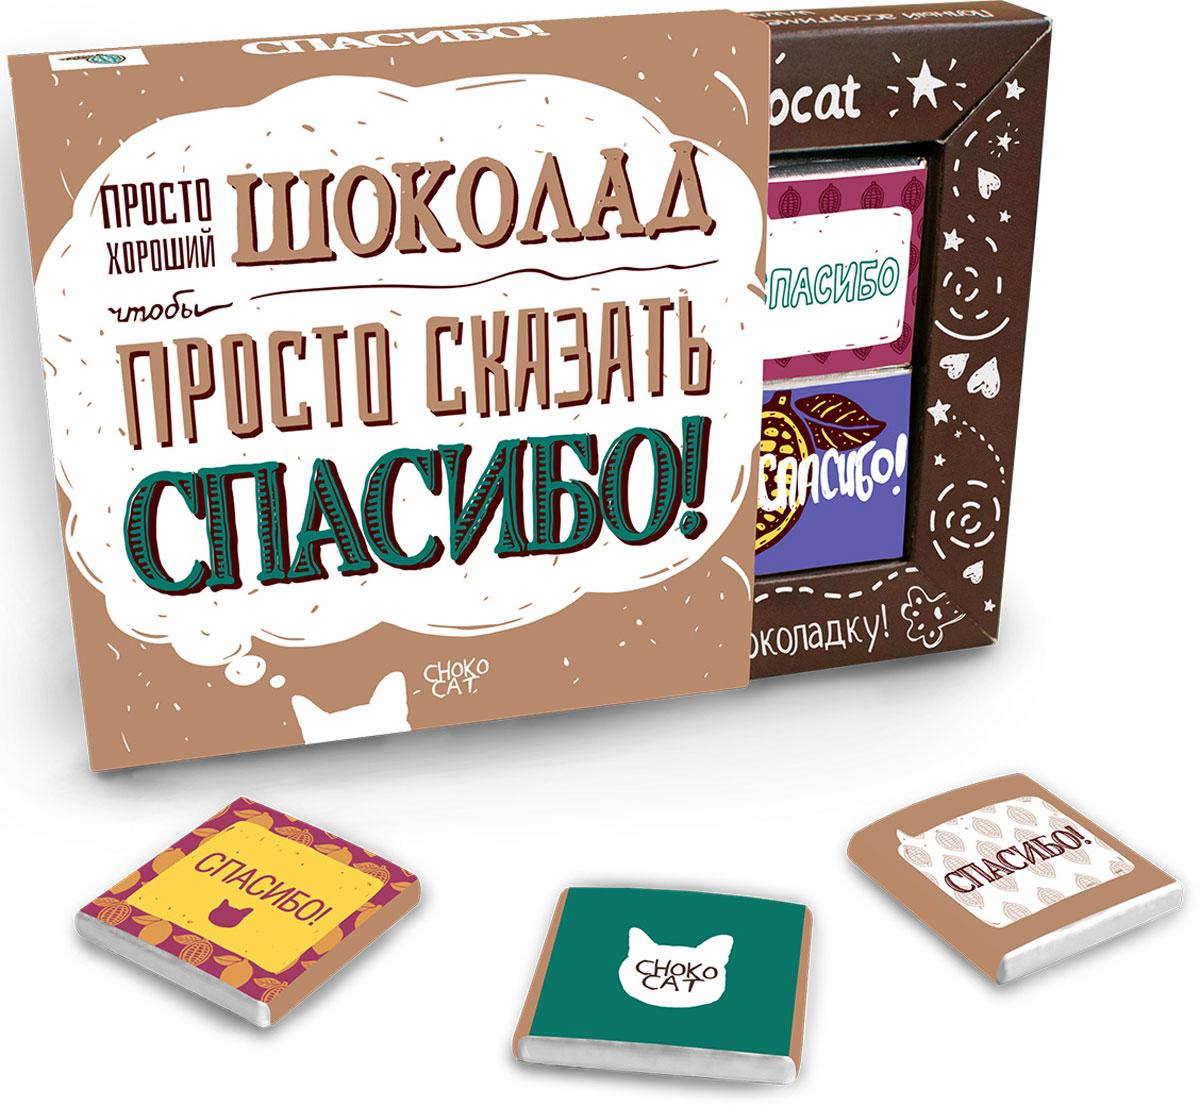 Chokocat Спасибо молочный шоколад, 60 г chokocat спасибо темный шоколад 85 г